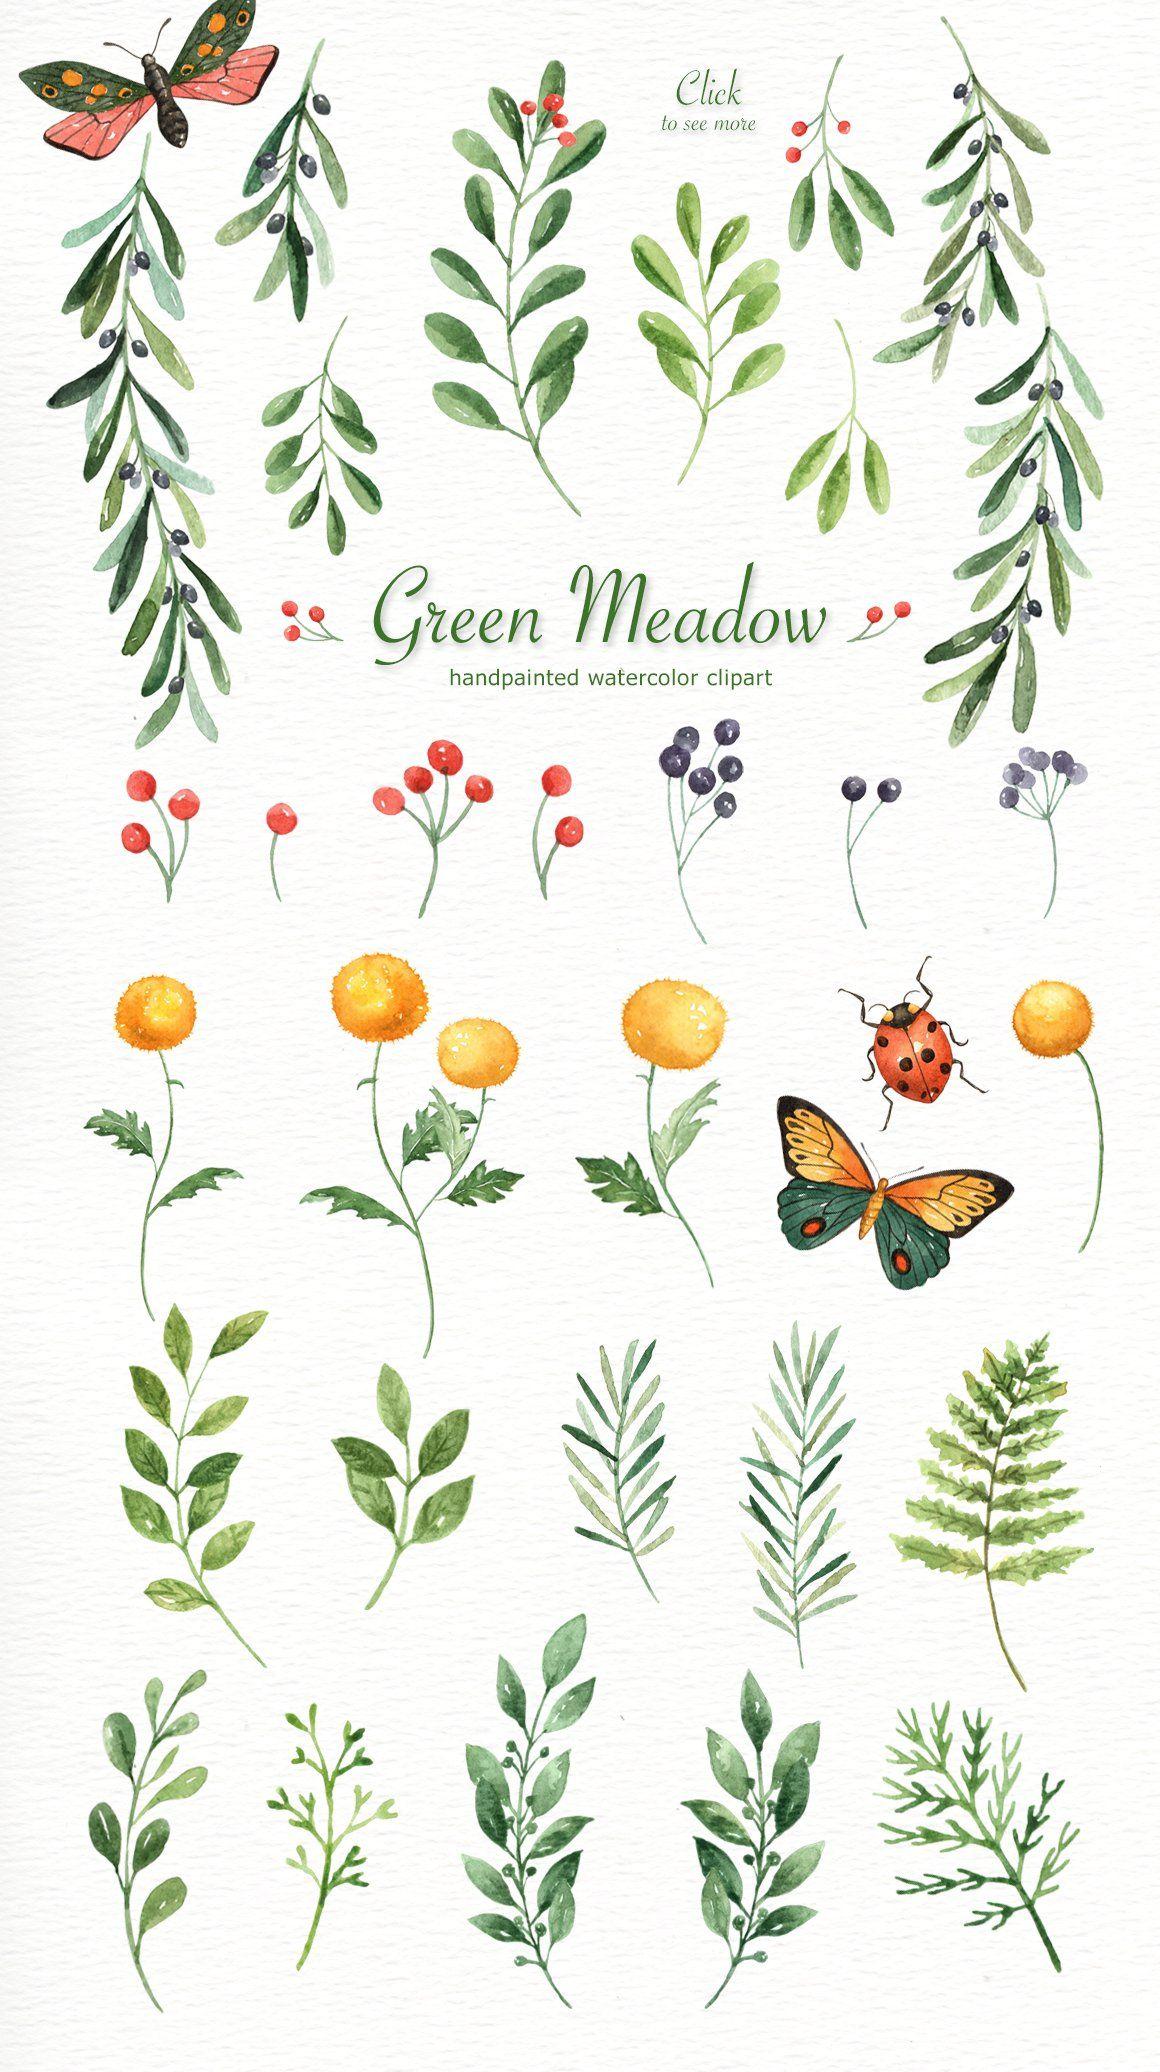 Green Meadow Watercolor clipart